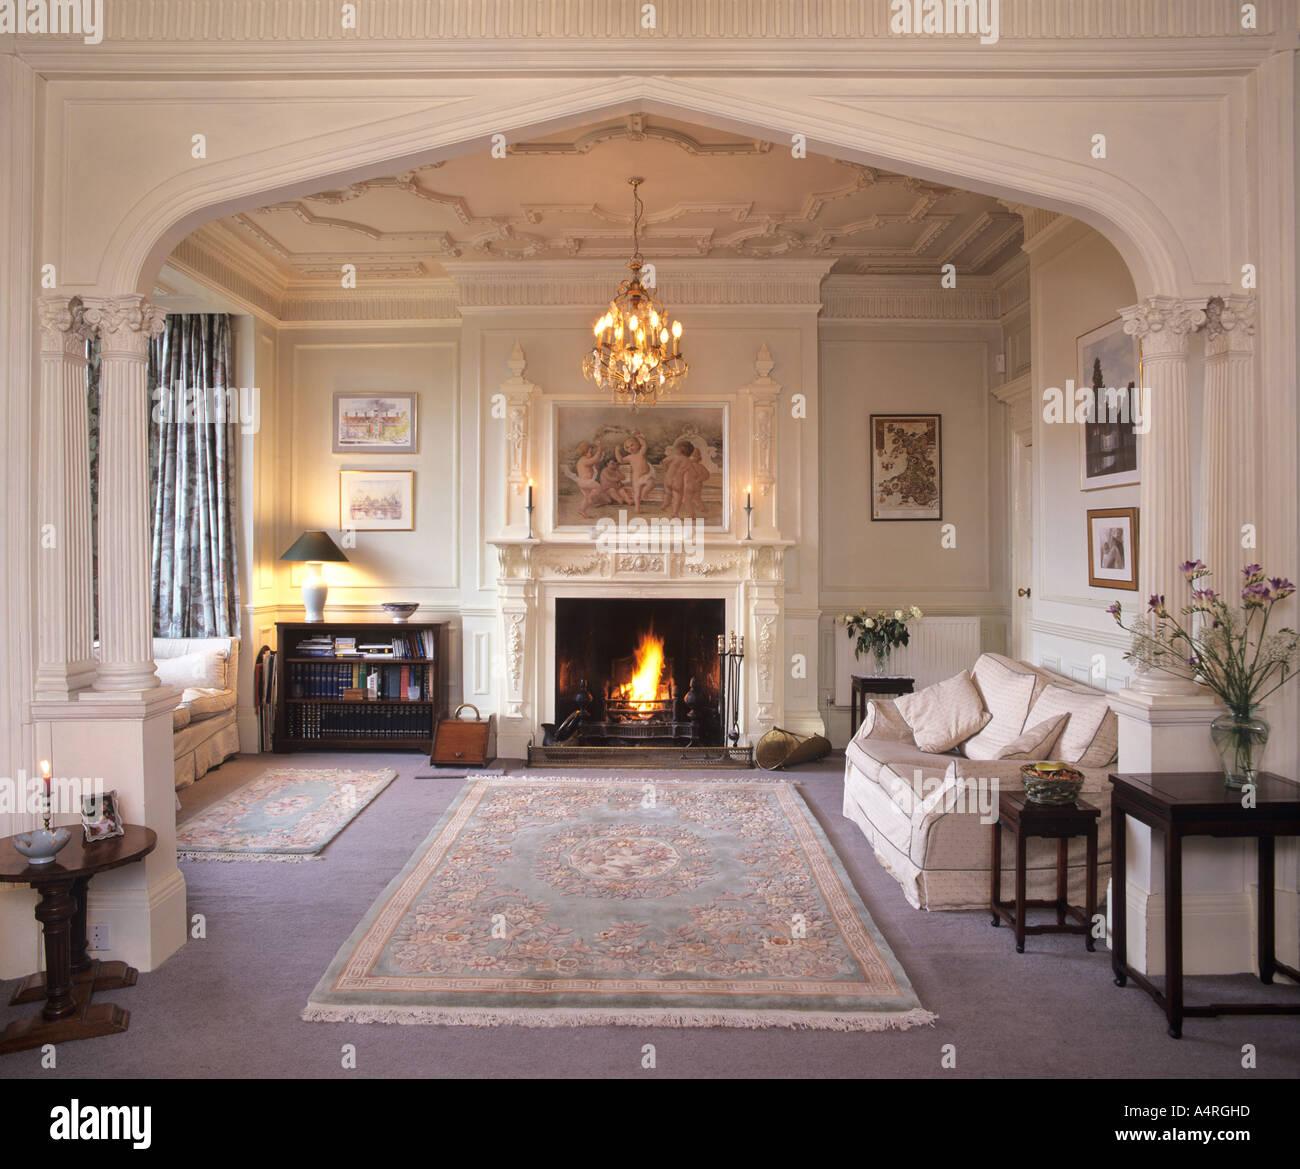 sofa basel kaufen recliner set amazon salon interieur, landhaus, england stockfoto, bild ...